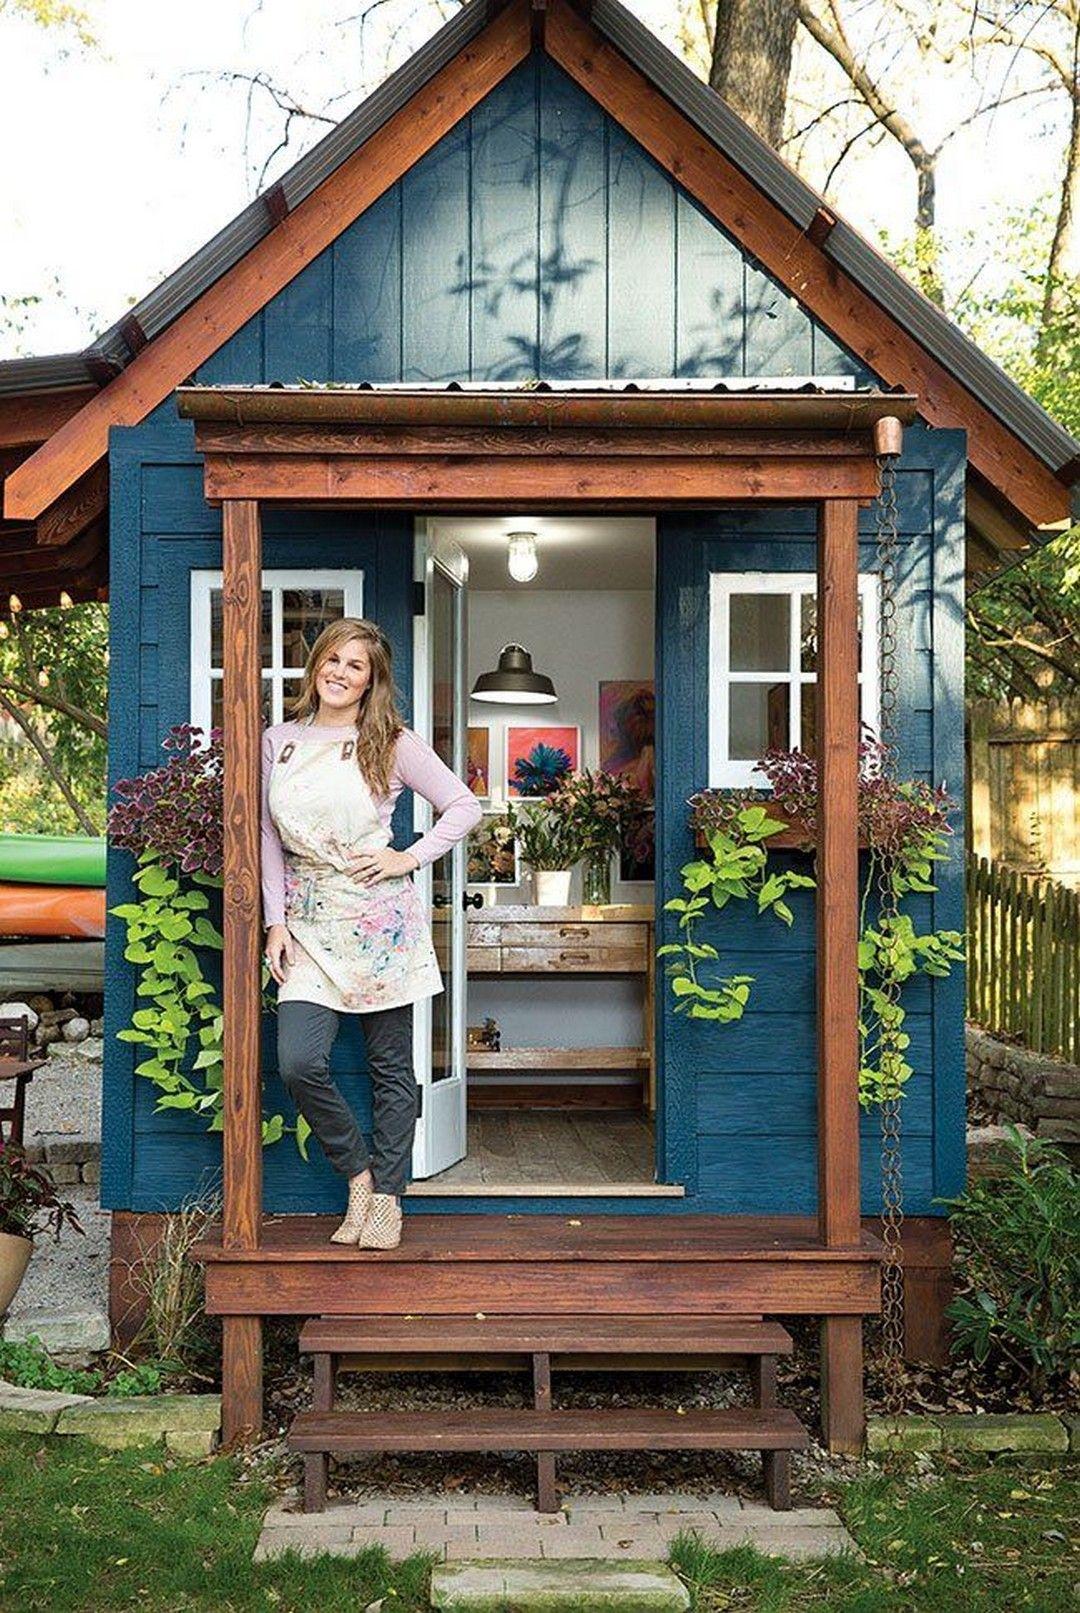 Pin By Dais Kurniawan On Cabin Shed Decor Shed Design House And Home Magazine Backyard garden shed ideas